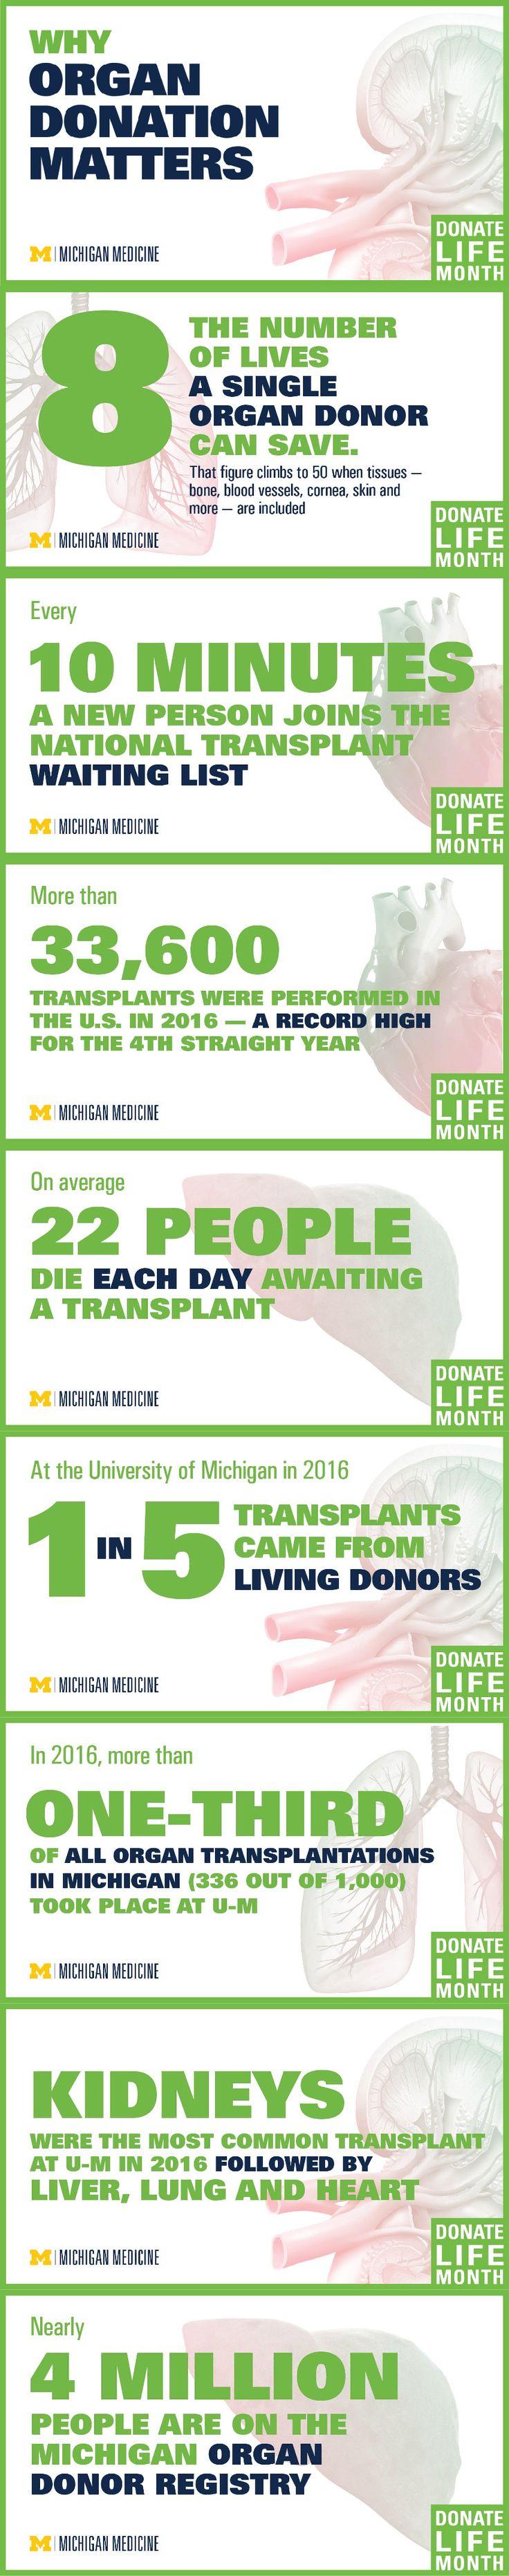 Why organ donation matters. #DonateLifeMonth